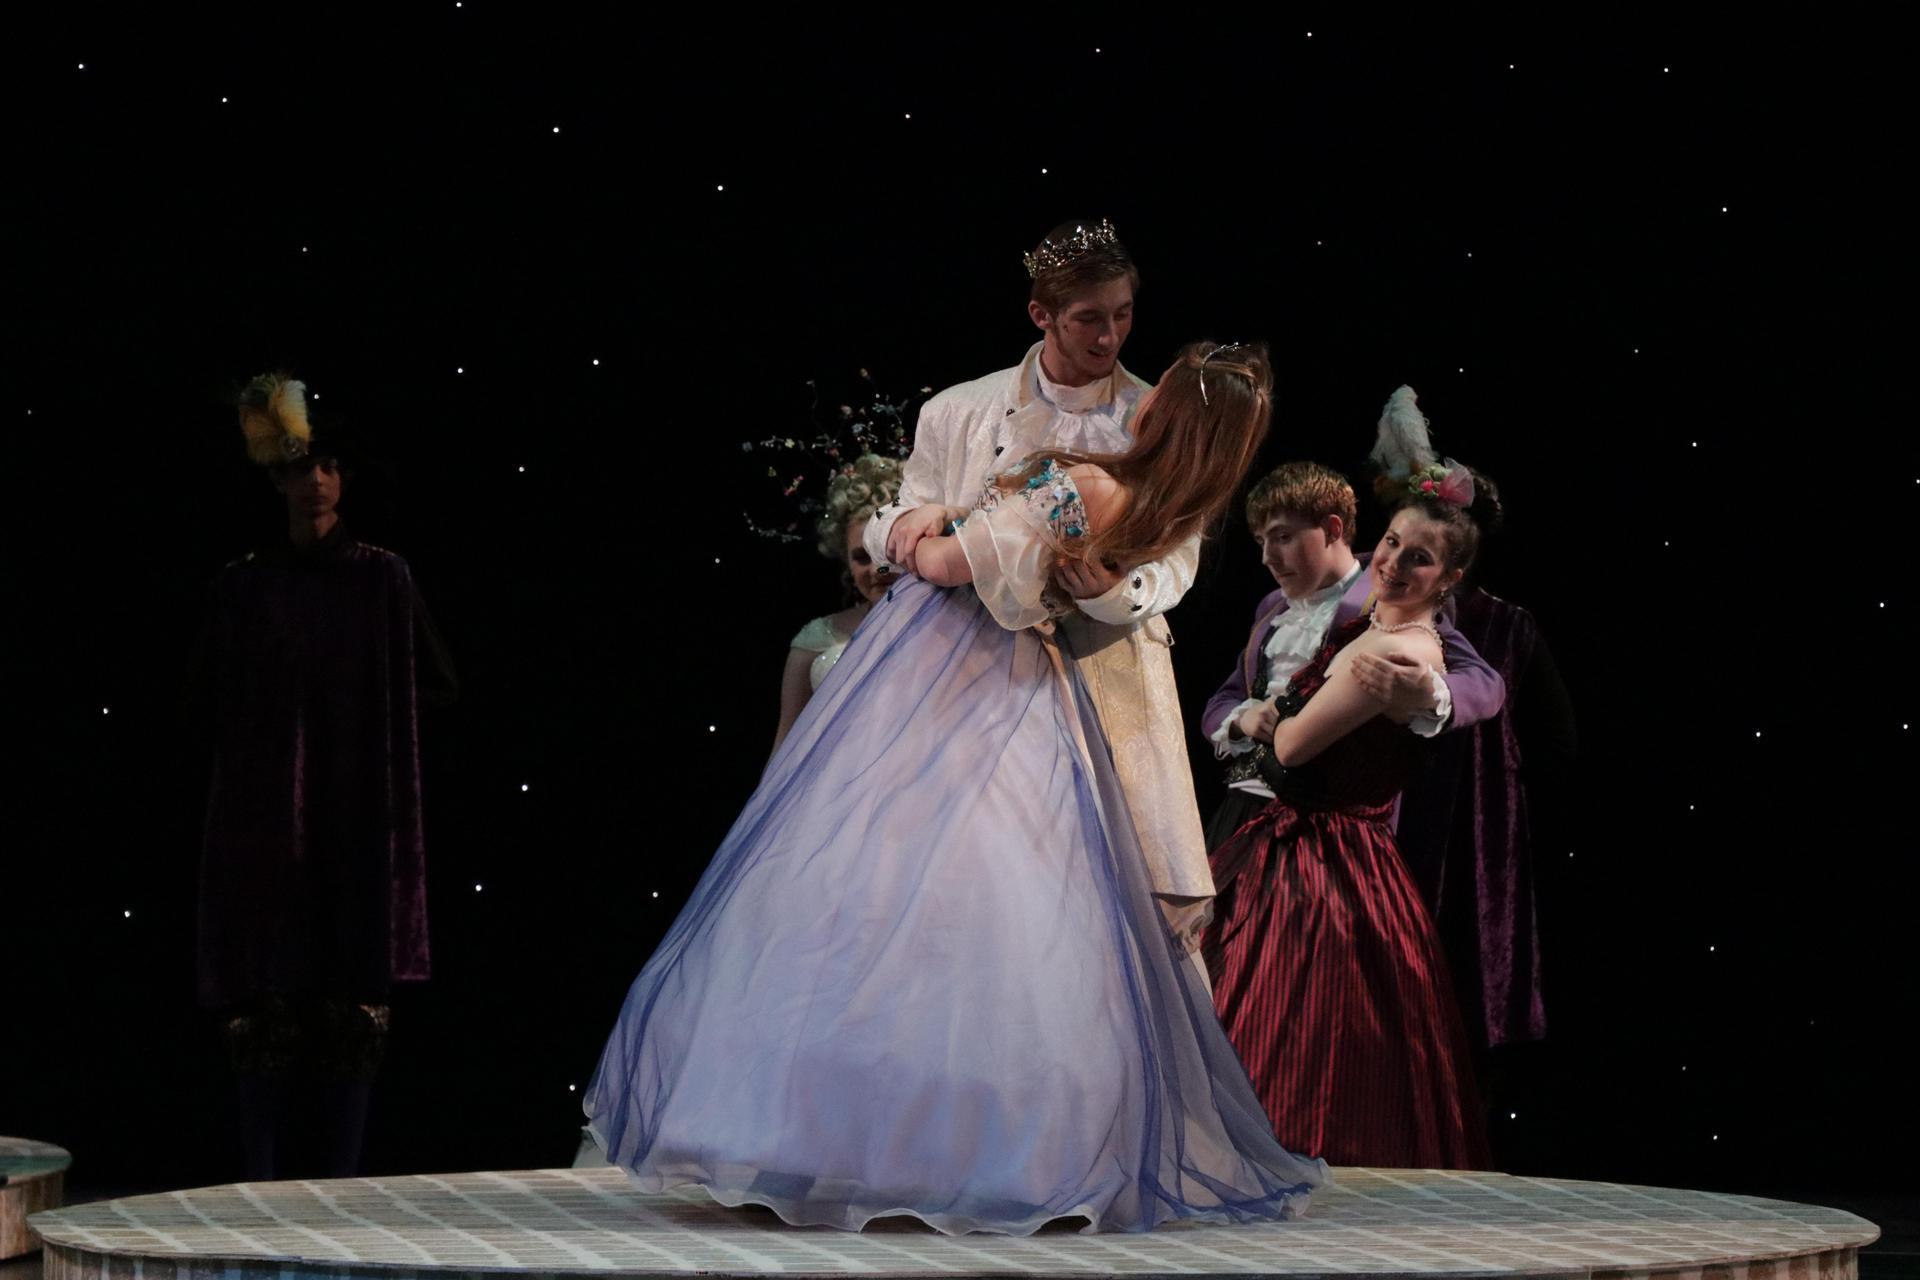 Cinderella musical performance